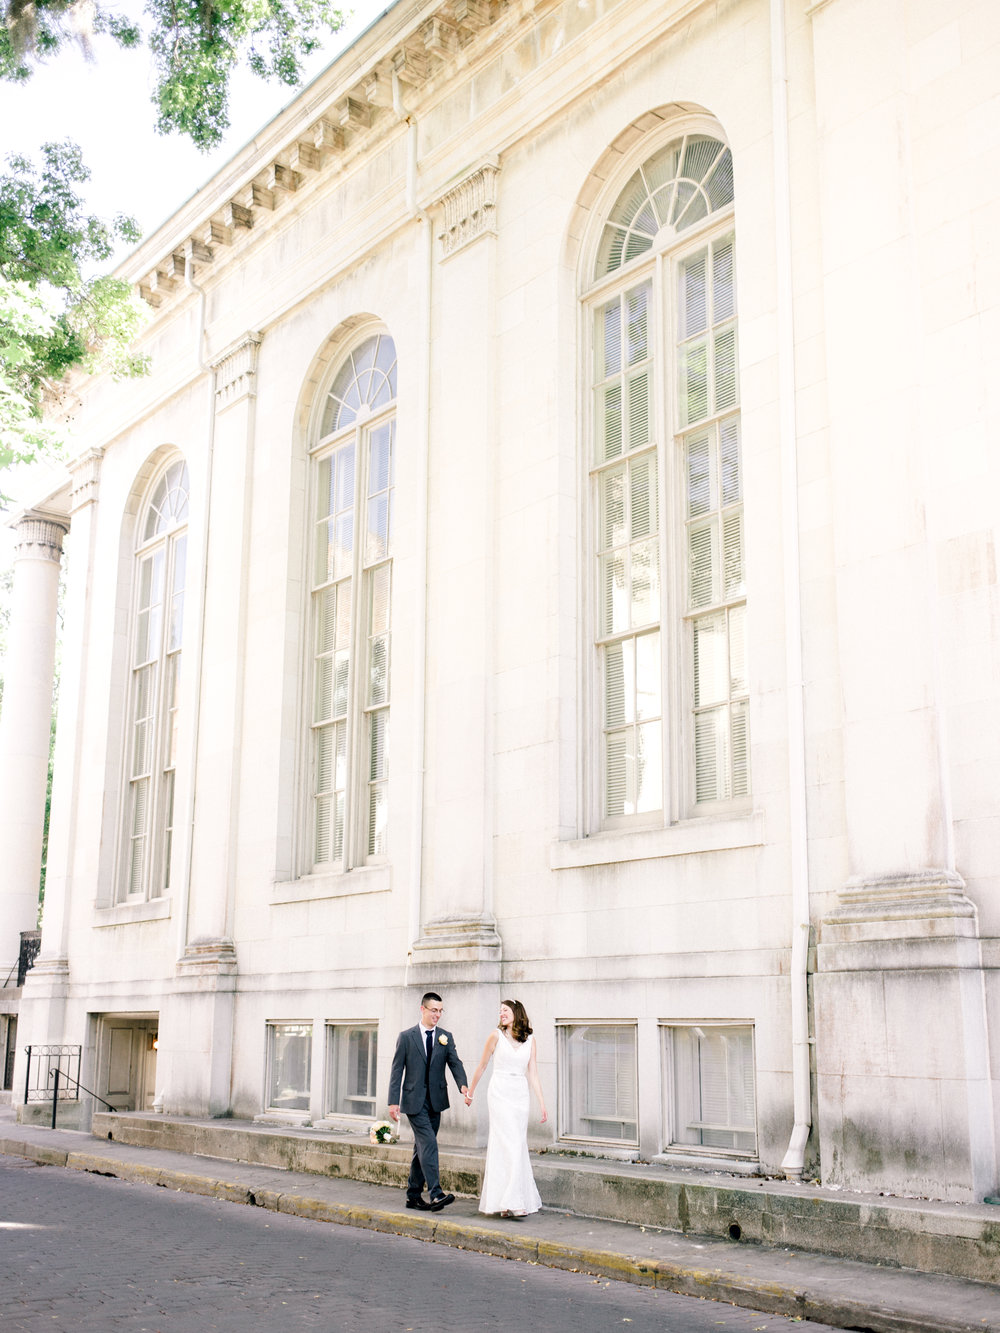 1savannah elopement foley houseIMG_8946.jpg